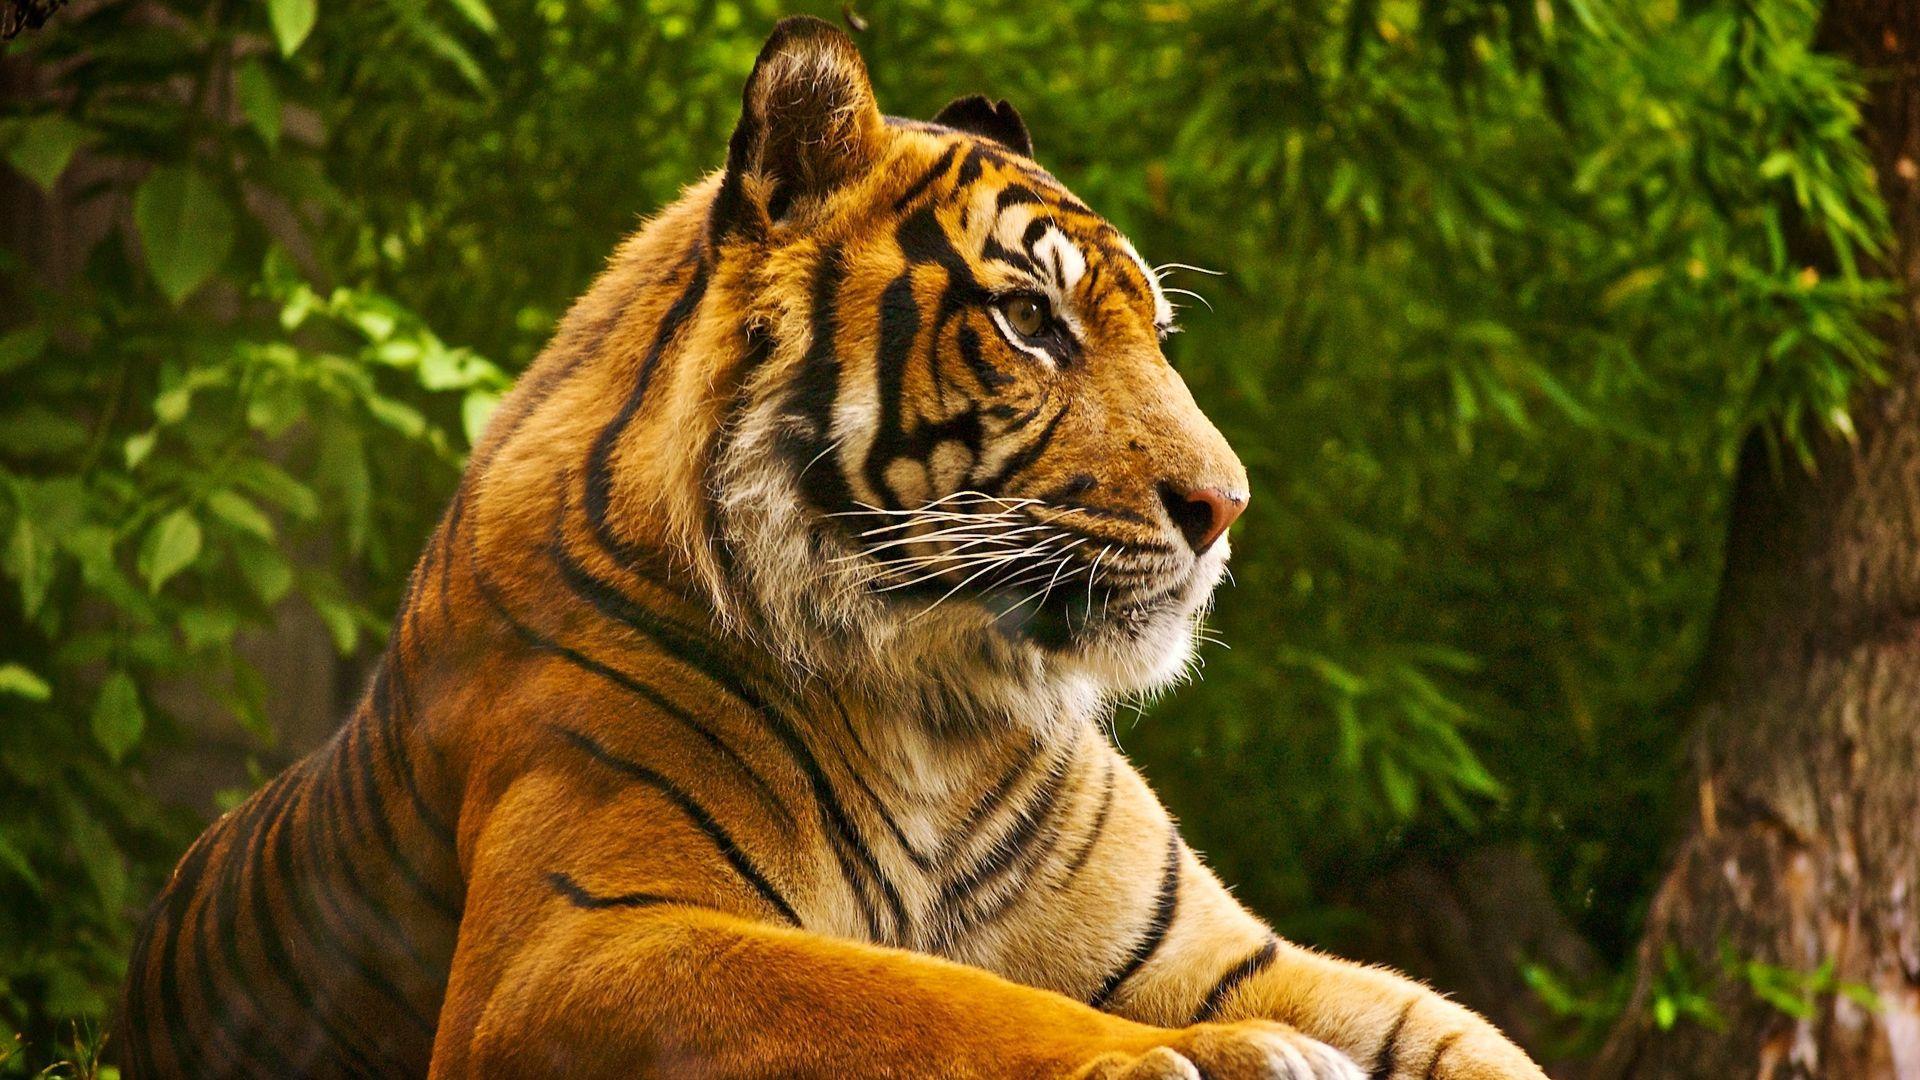 1920X1080 HD Animals Wallpapers - Top Free 1920X1080 HD Animals ...